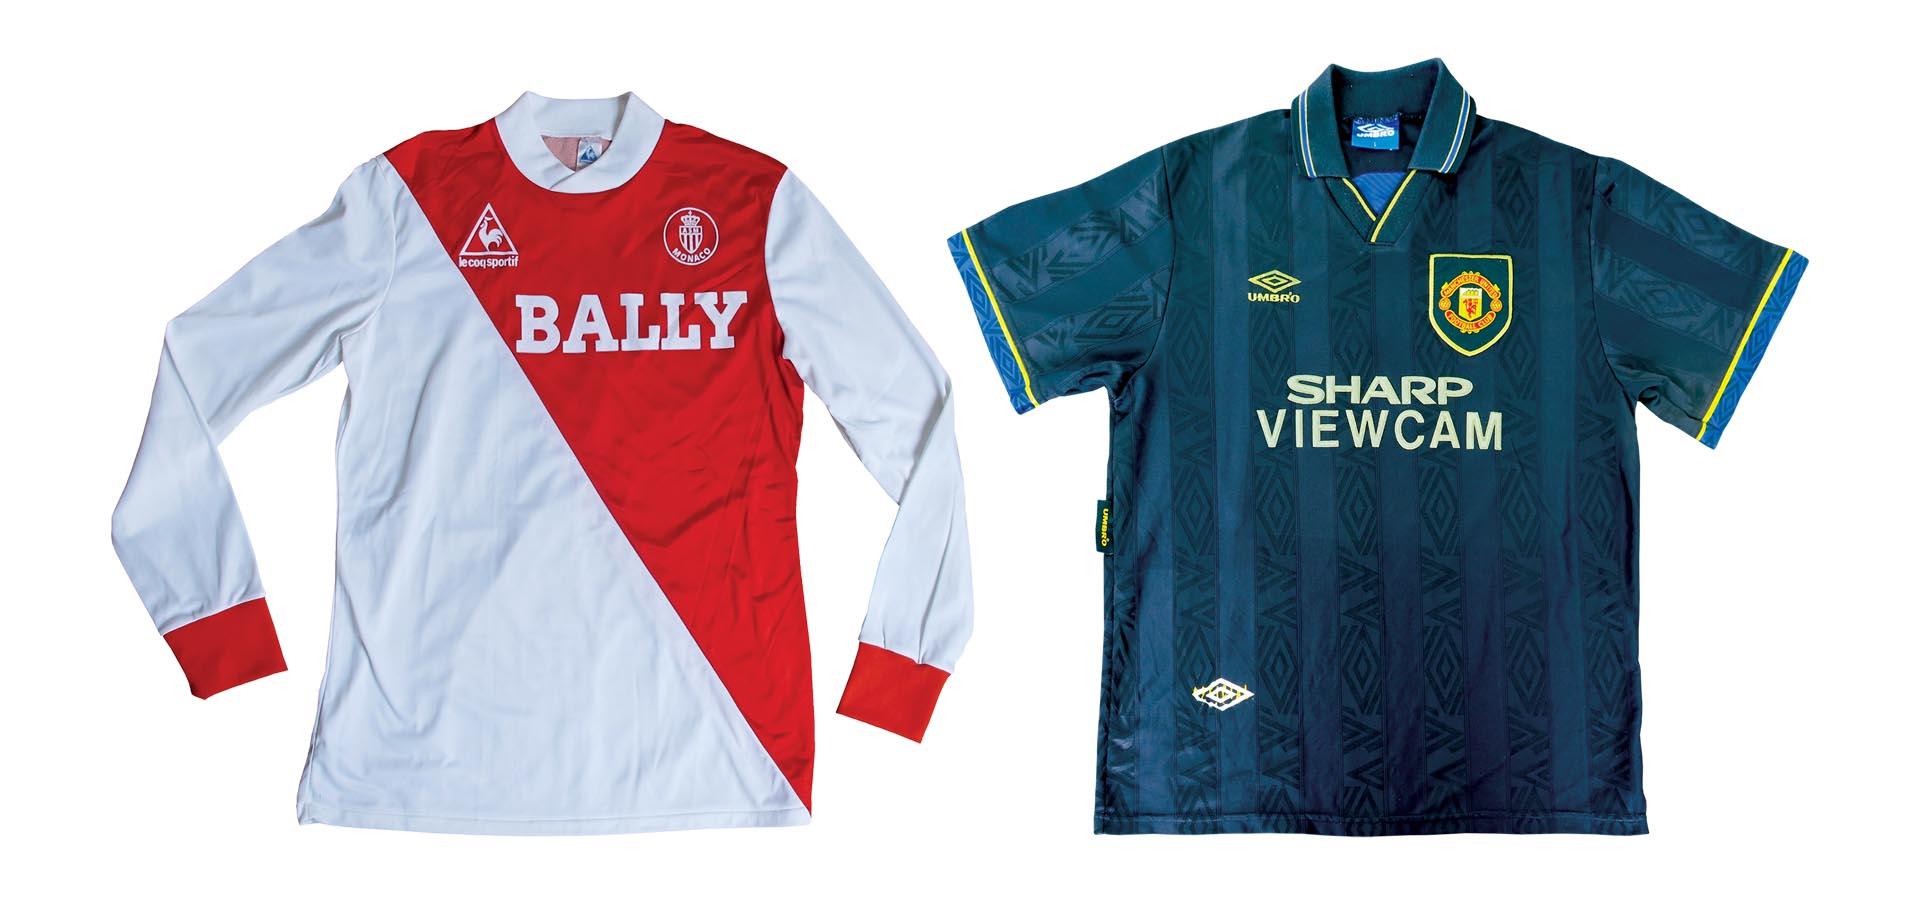 neal-heard-jacket-required-art-of-the-football-shirt_0001_monaco-bally-shirt